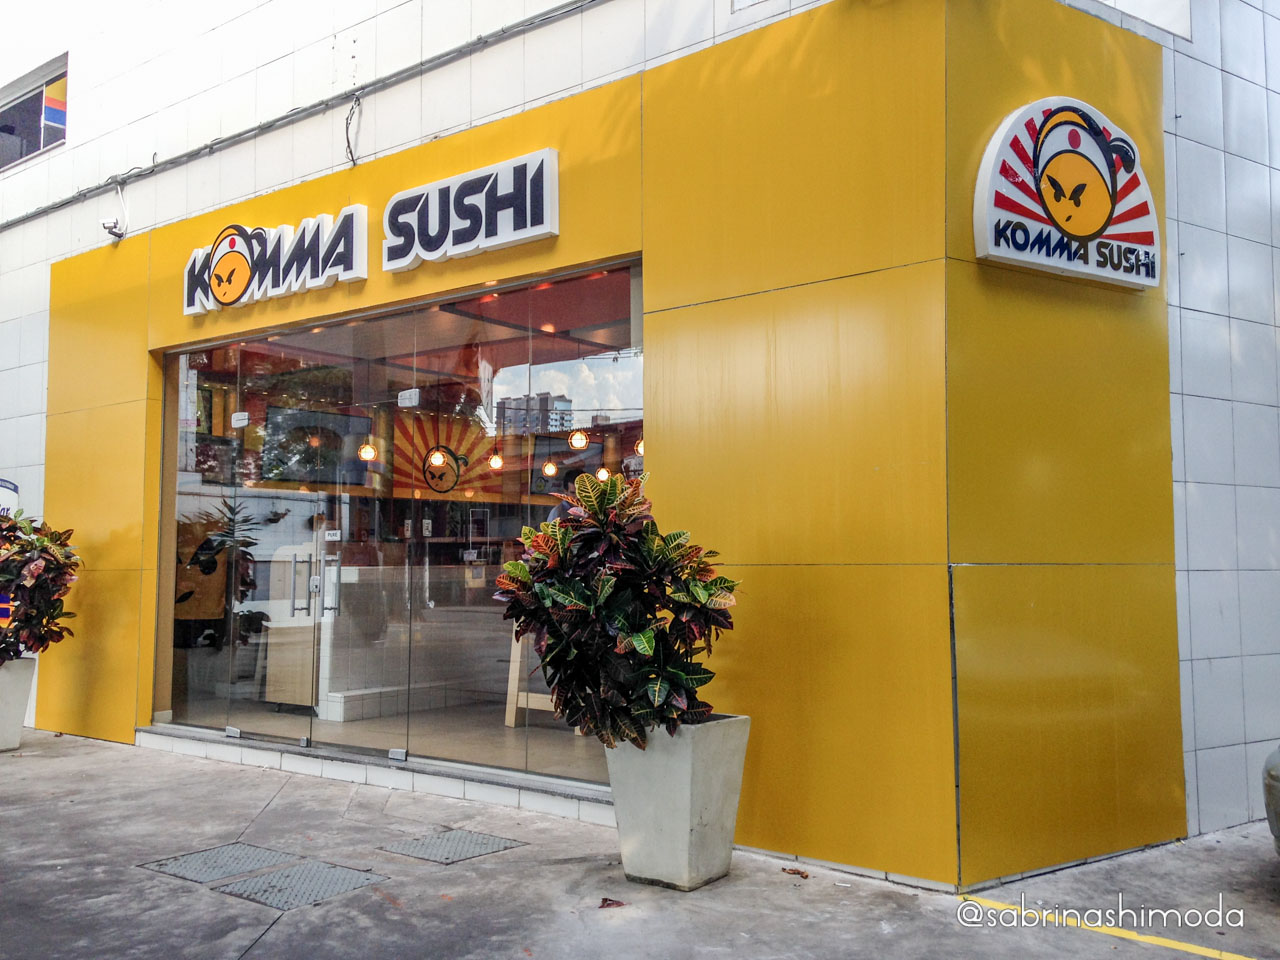 201501-COM-Komma-Sushi-011